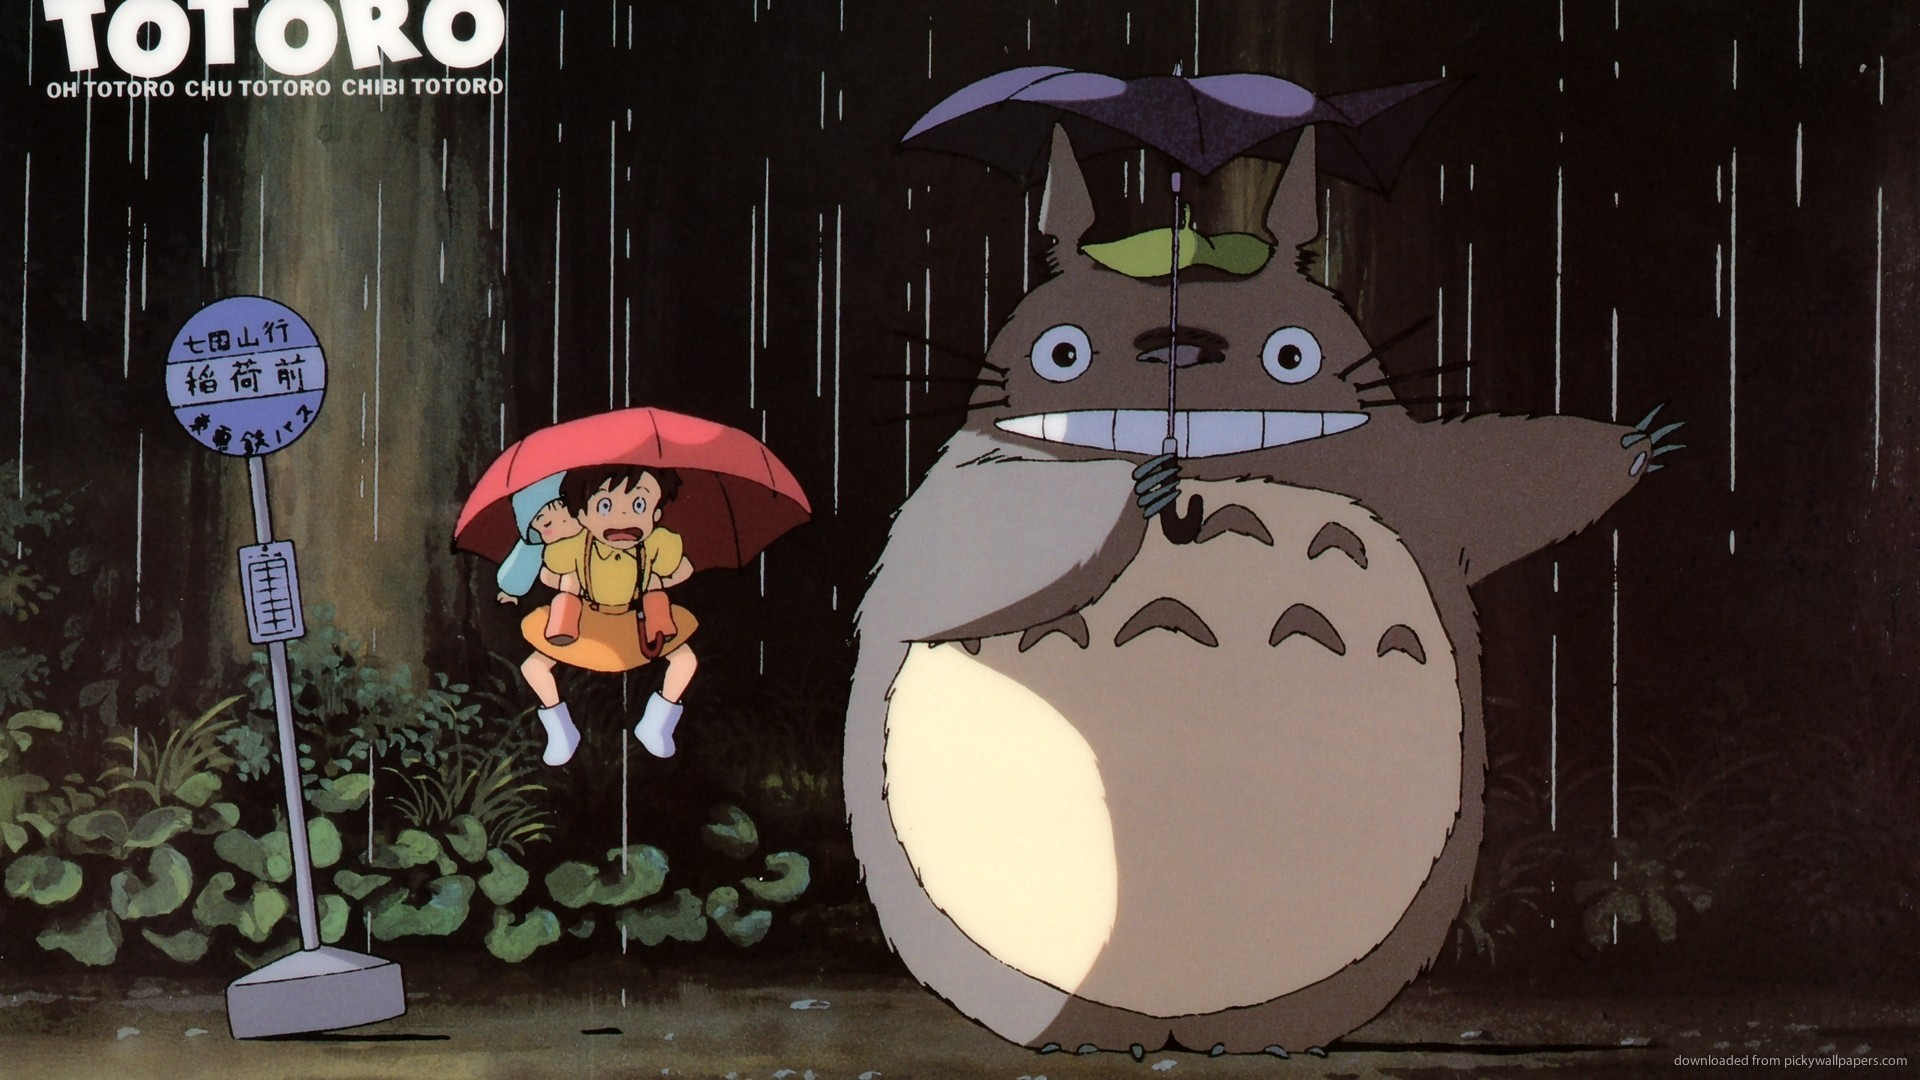 Gravity Falls Wallpaper Full Hd My Neighbor Totoro Wallpaper 183 ① Download Free Beautiful